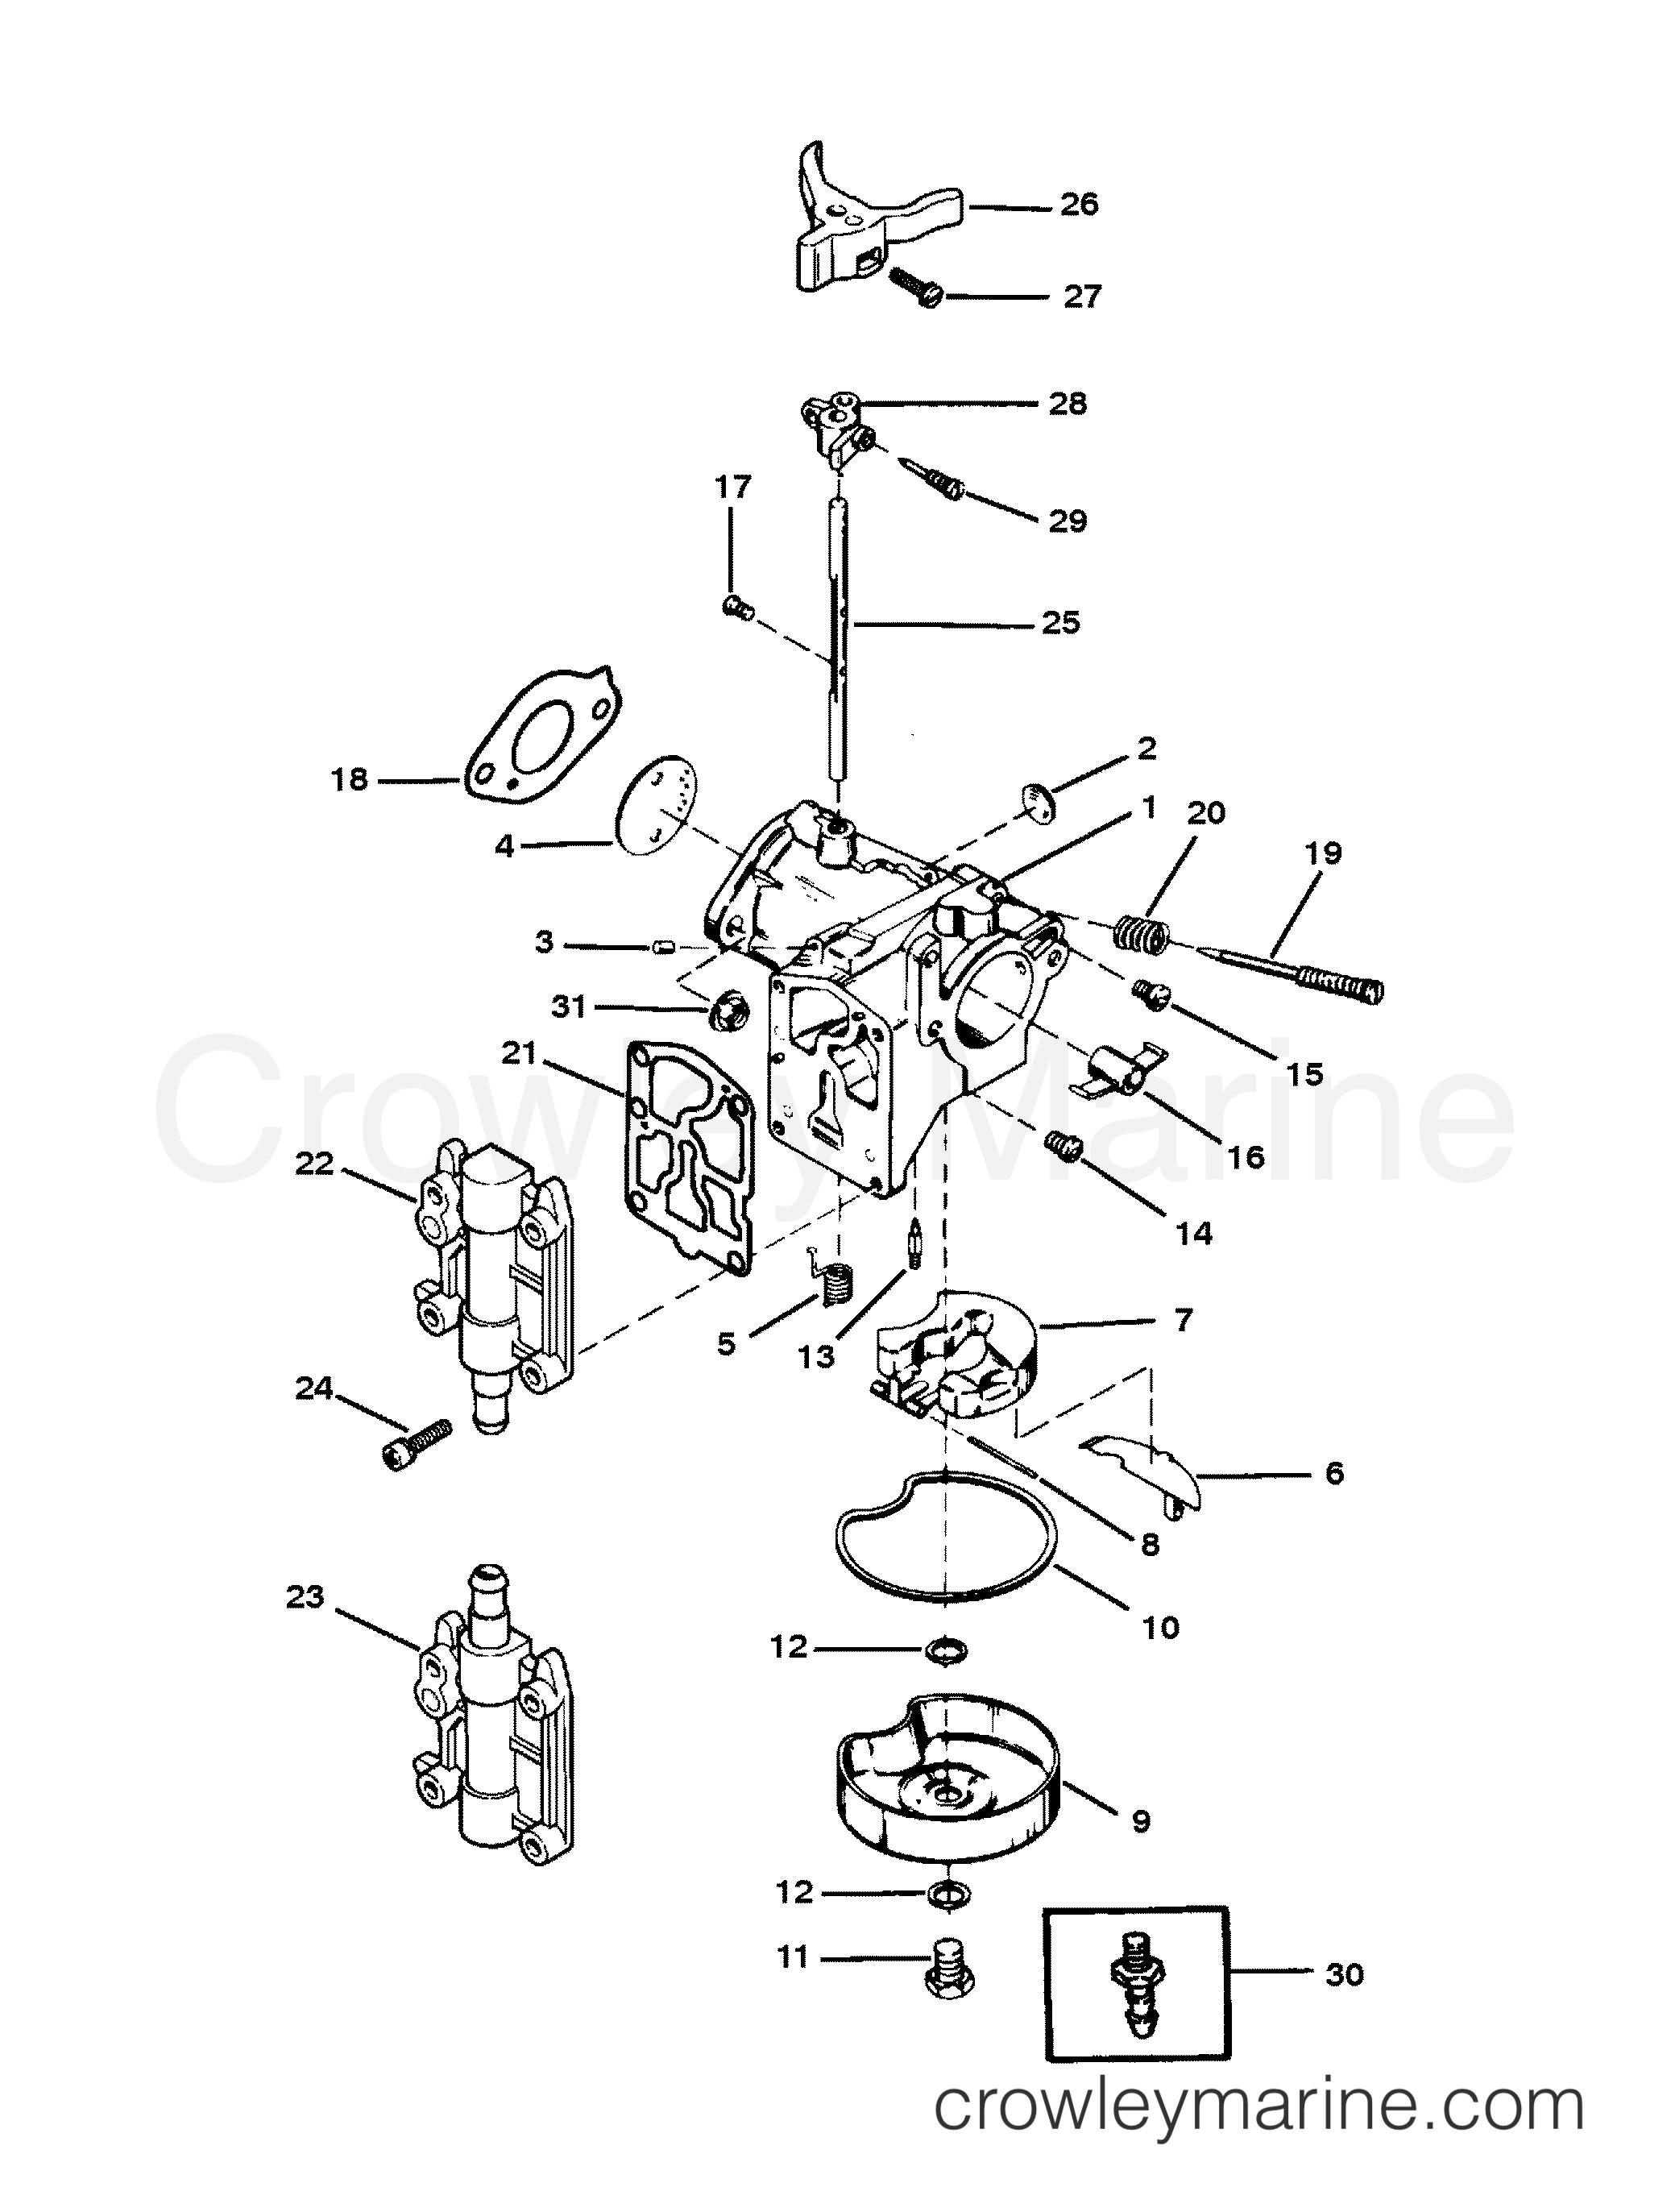 Mariner Wiring Diagram 30 Hp Page 6 And Schematics 25 Outboard Diagrams Source Carburetor Embly 1989 40 Elhpto 70404119d Rh Crowleymarine Com Motor